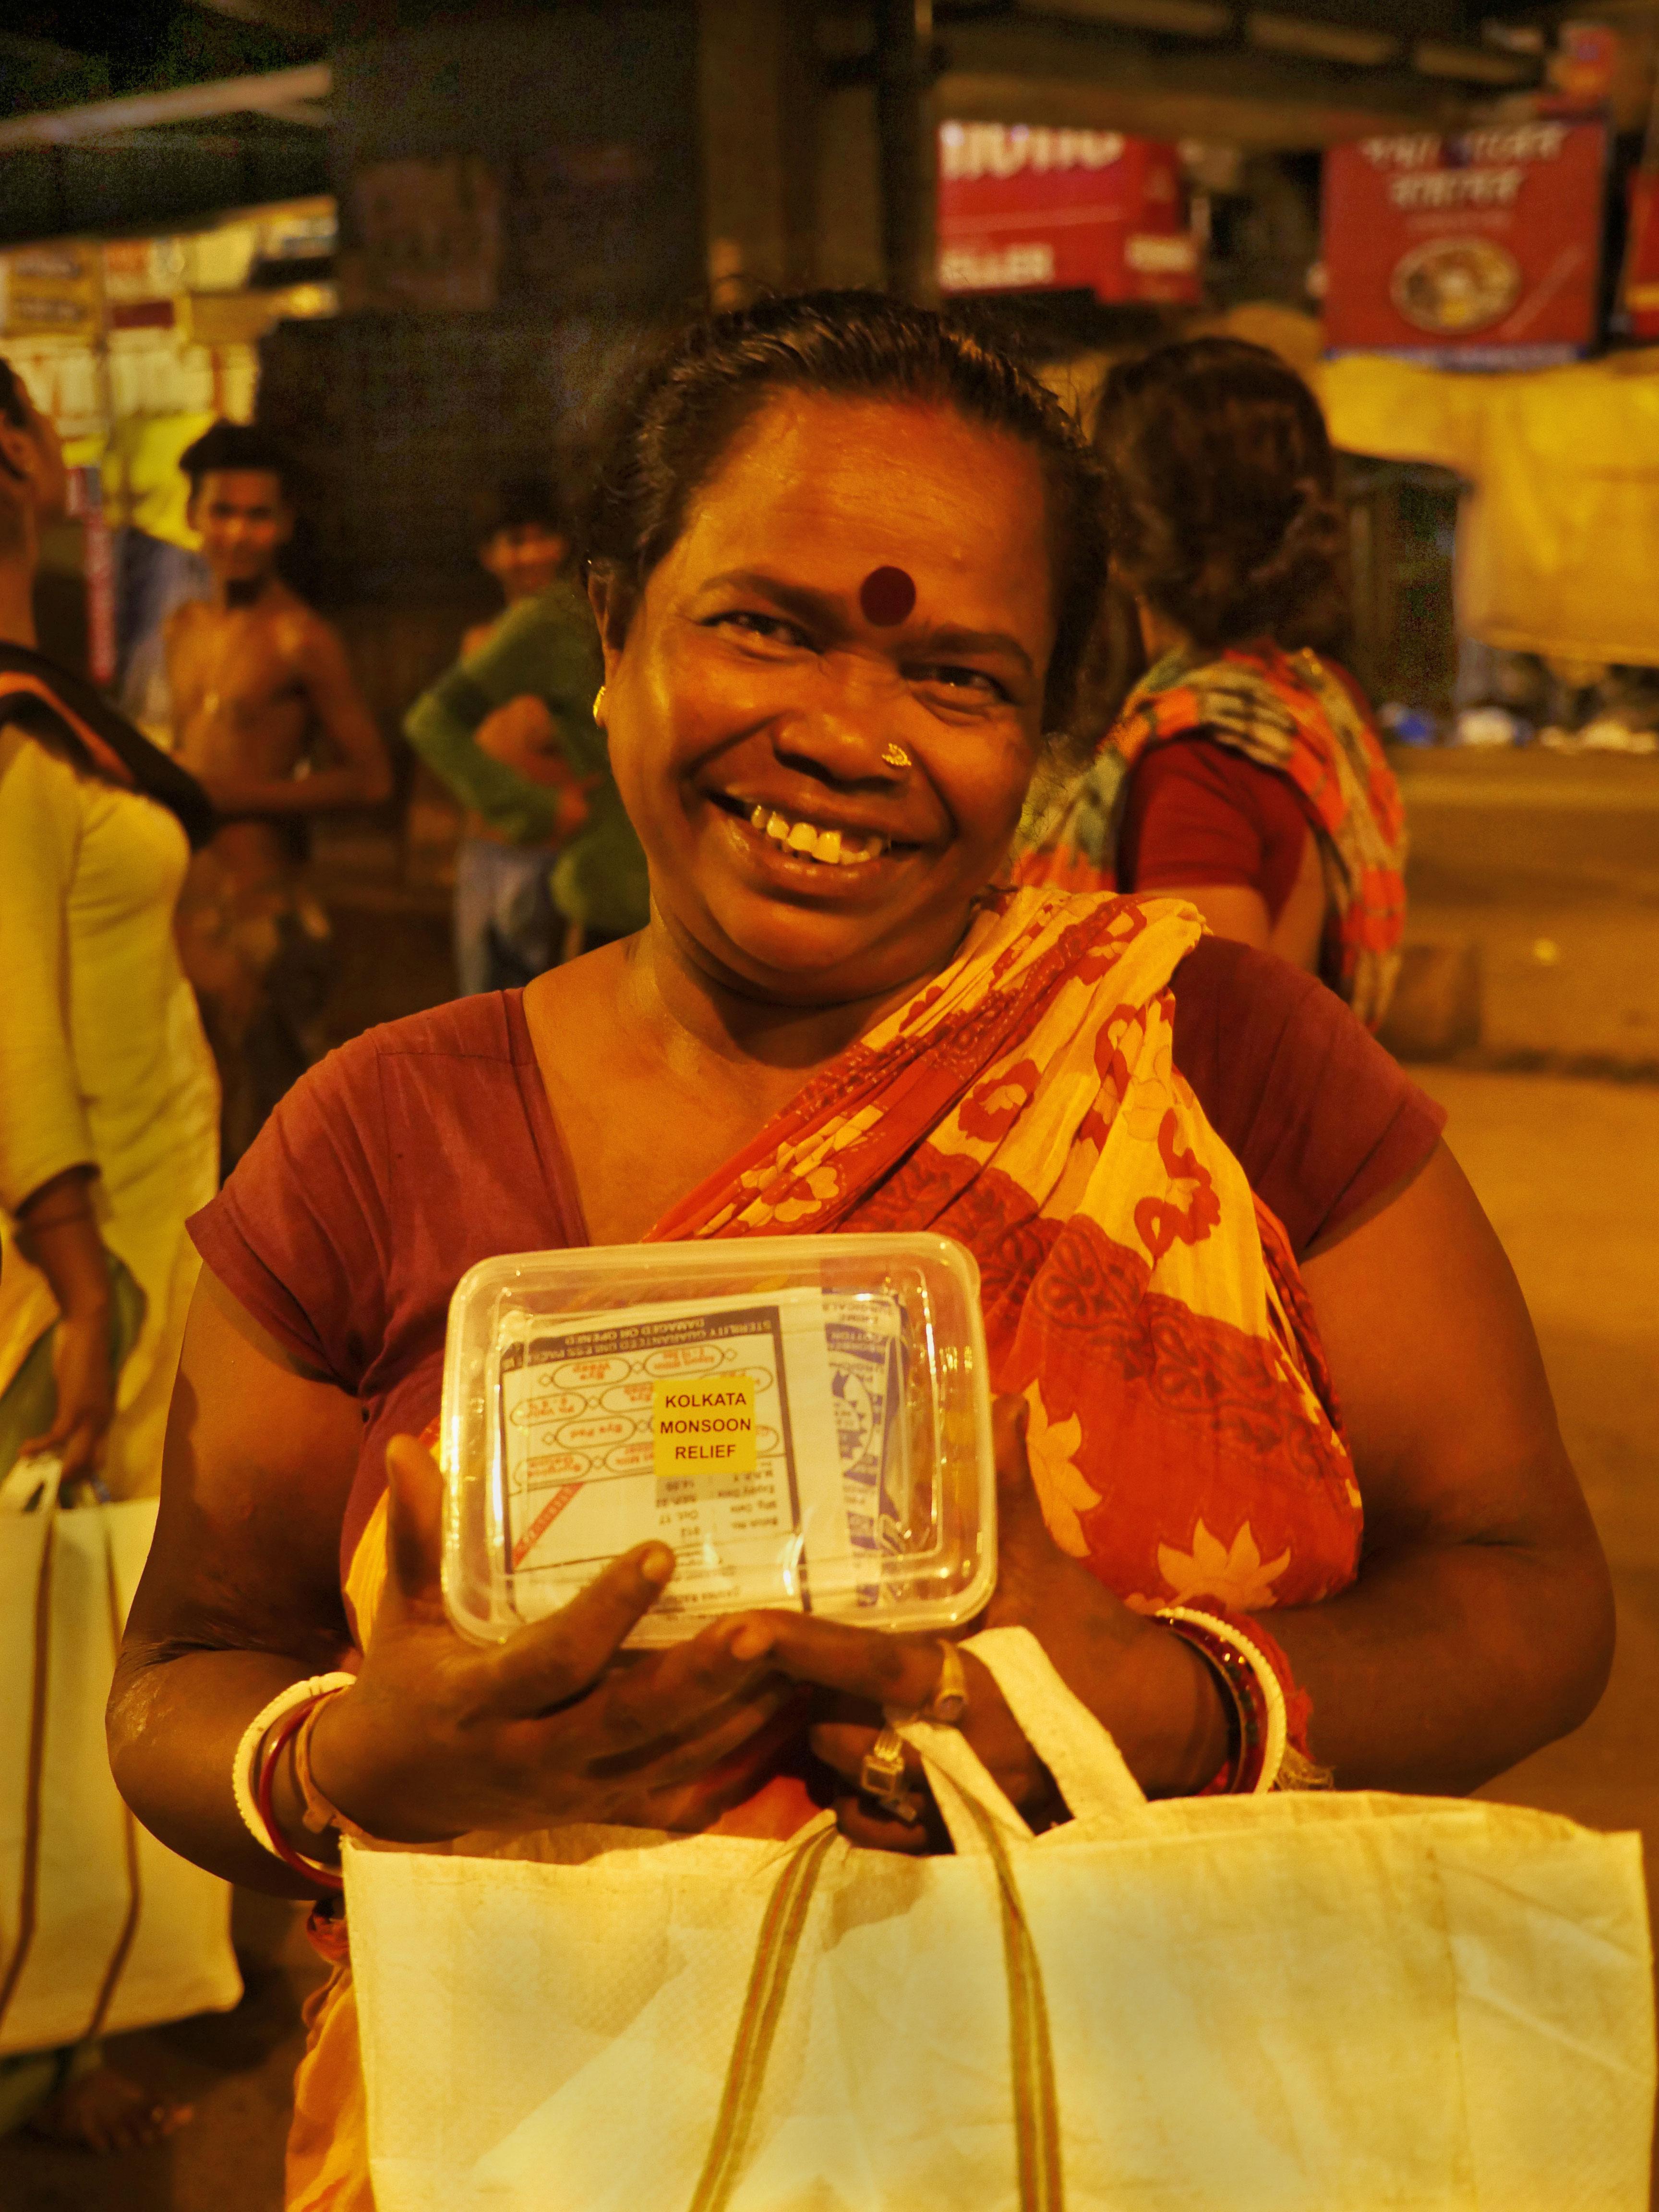 The Kolkata Monsoon Relief kit.